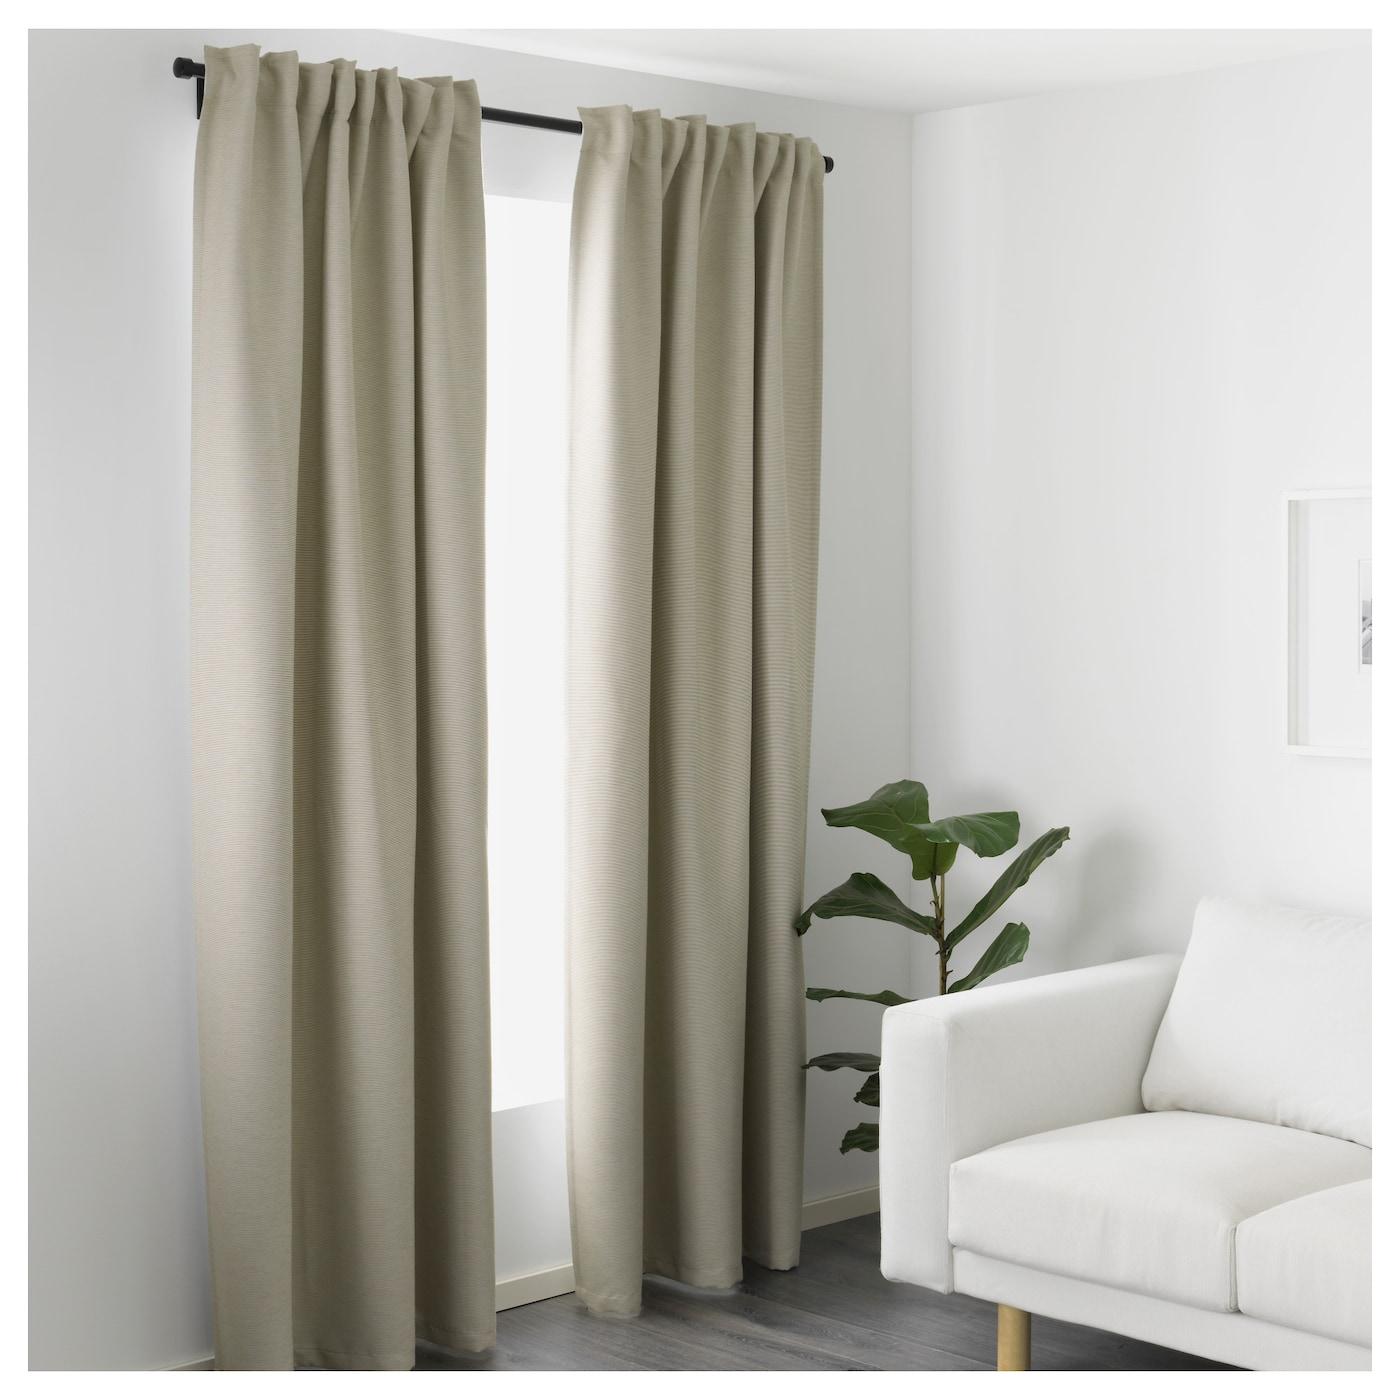 vilborg gordijnen 1 paar beige 145 x 300 cm ikea. Black Bedroom Furniture Sets. Home Design Ideas